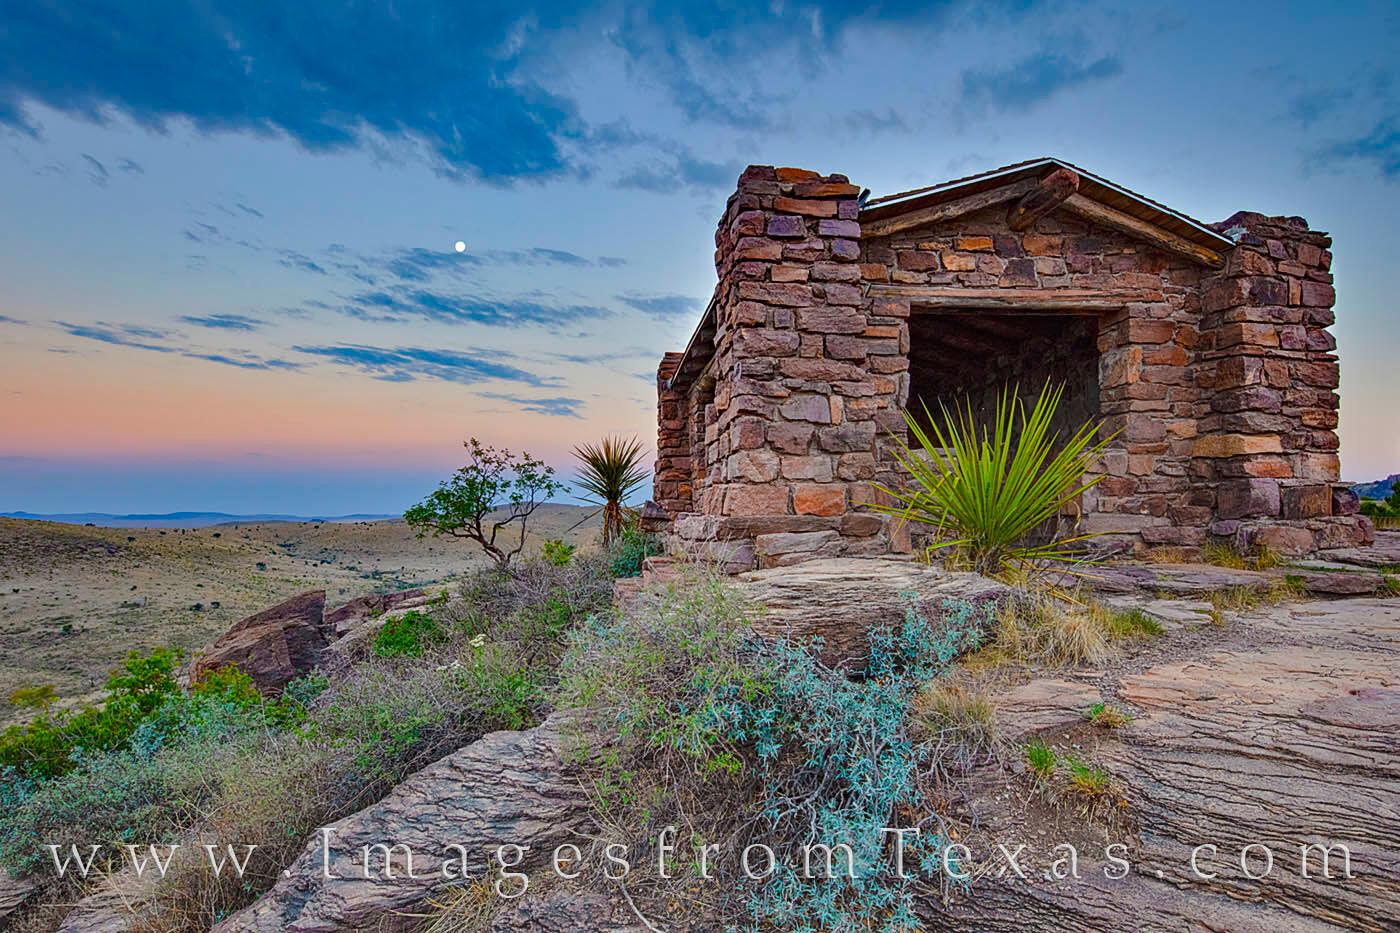 davis mountains, texas state parks, CCC Trail, west texas, fort davis, prints for sale, safe house, photo